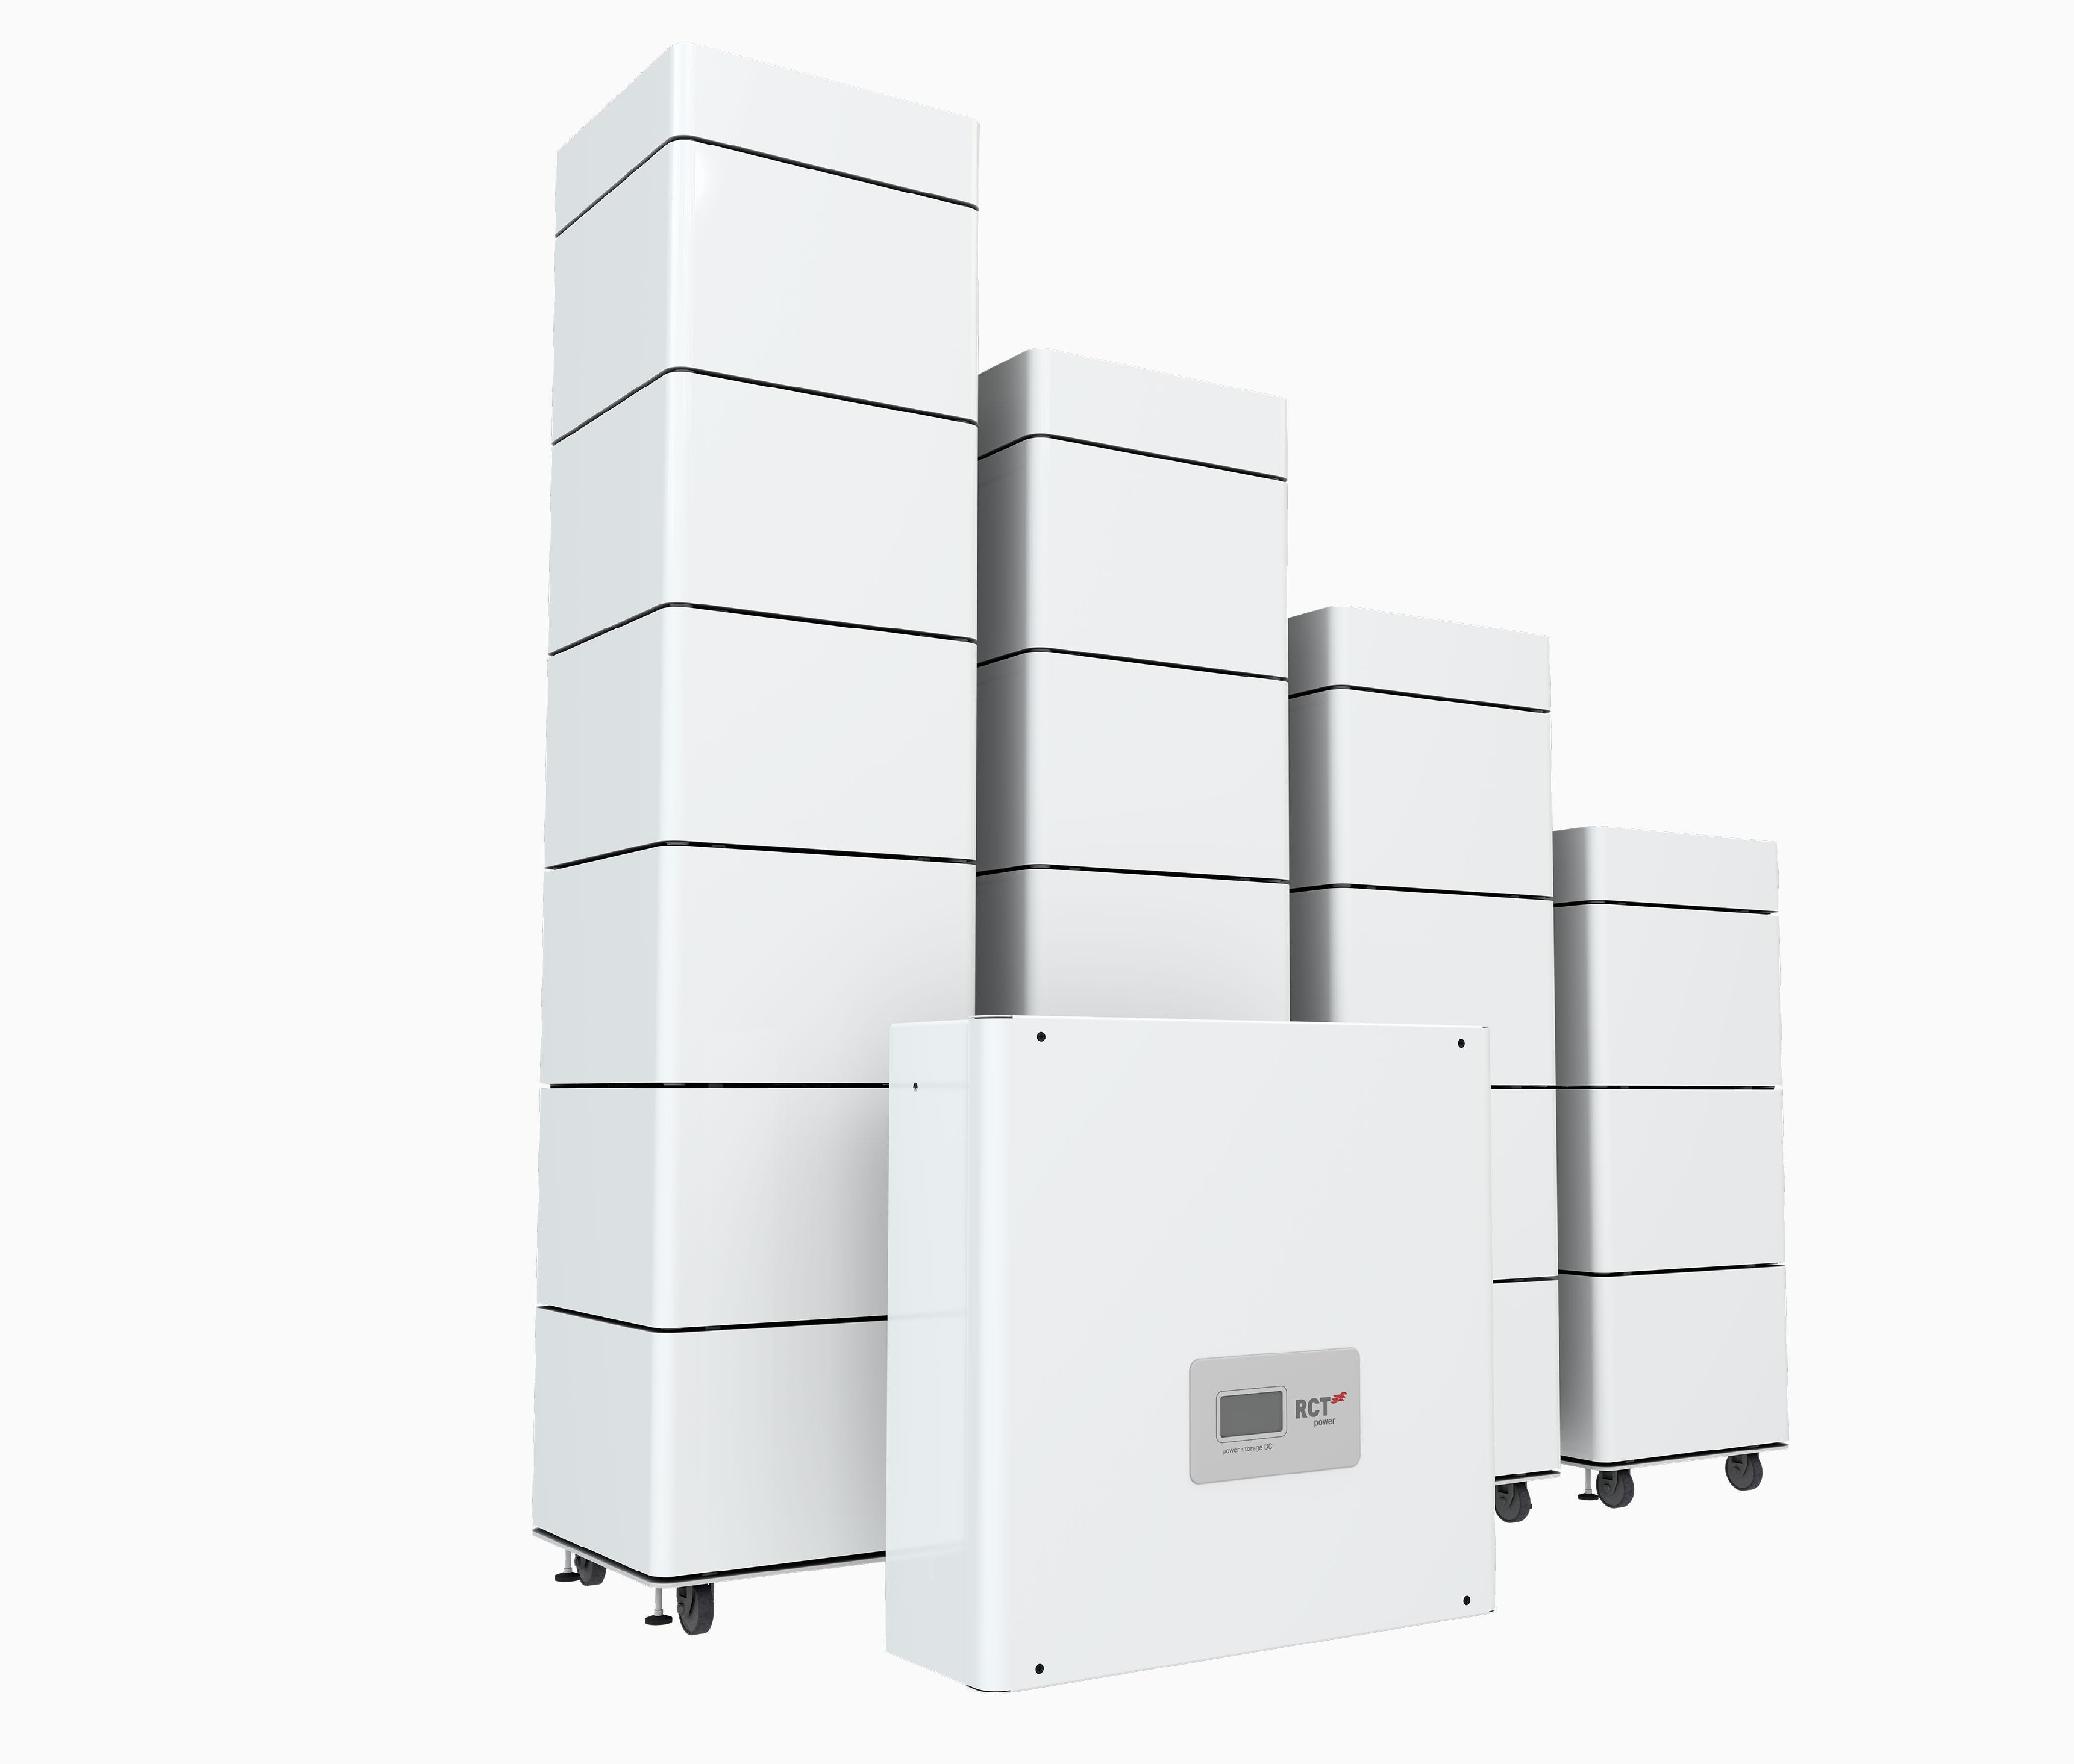 RCT Power GmbH I Durchdachte Speichertechnologie RCT